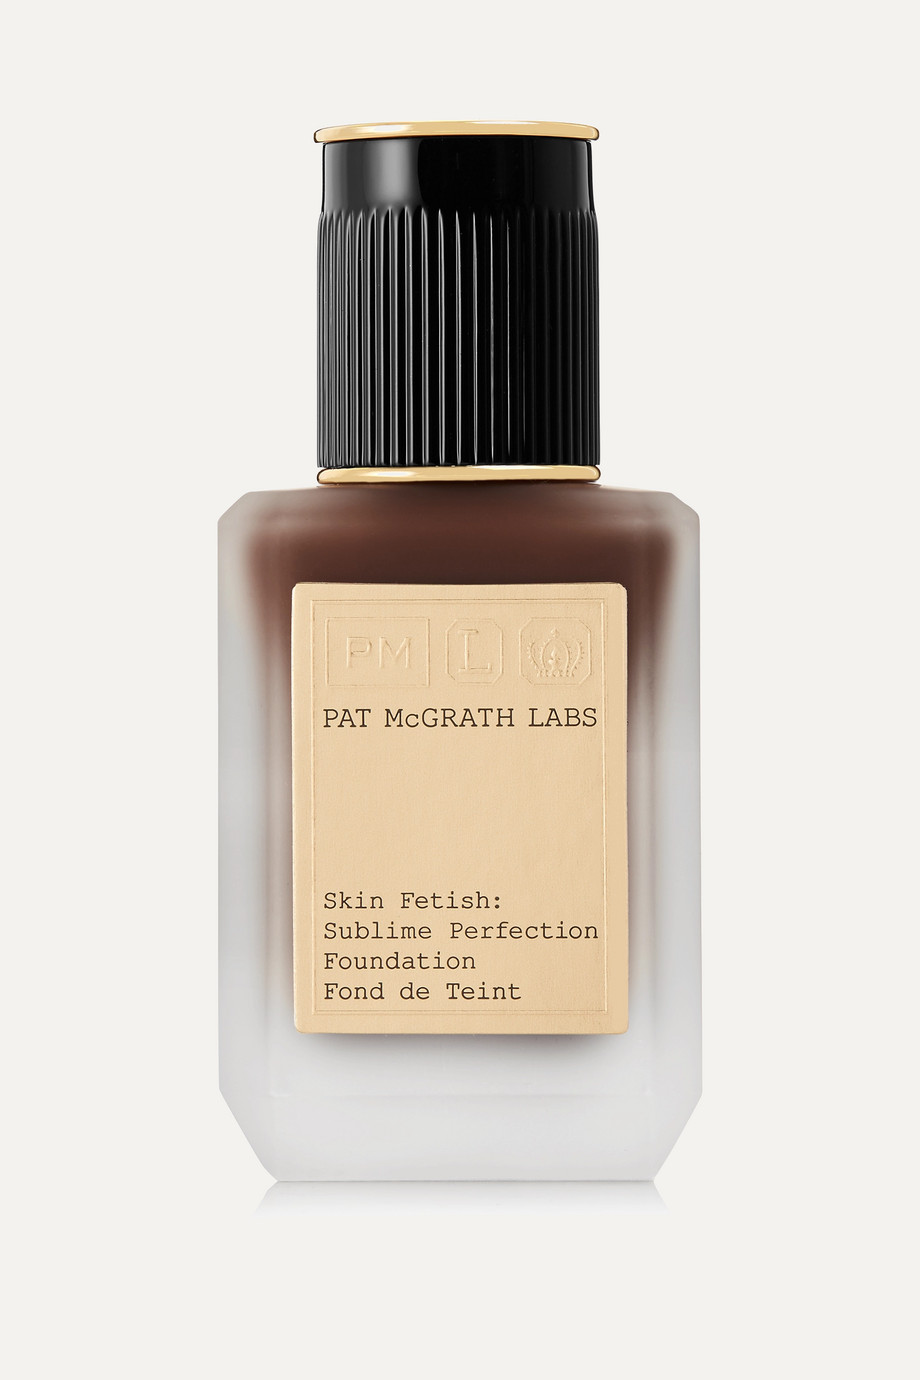 Pat McGrath Labs Skin Fetish: Sublime Perfection Foundation - Deep 34, 35ml